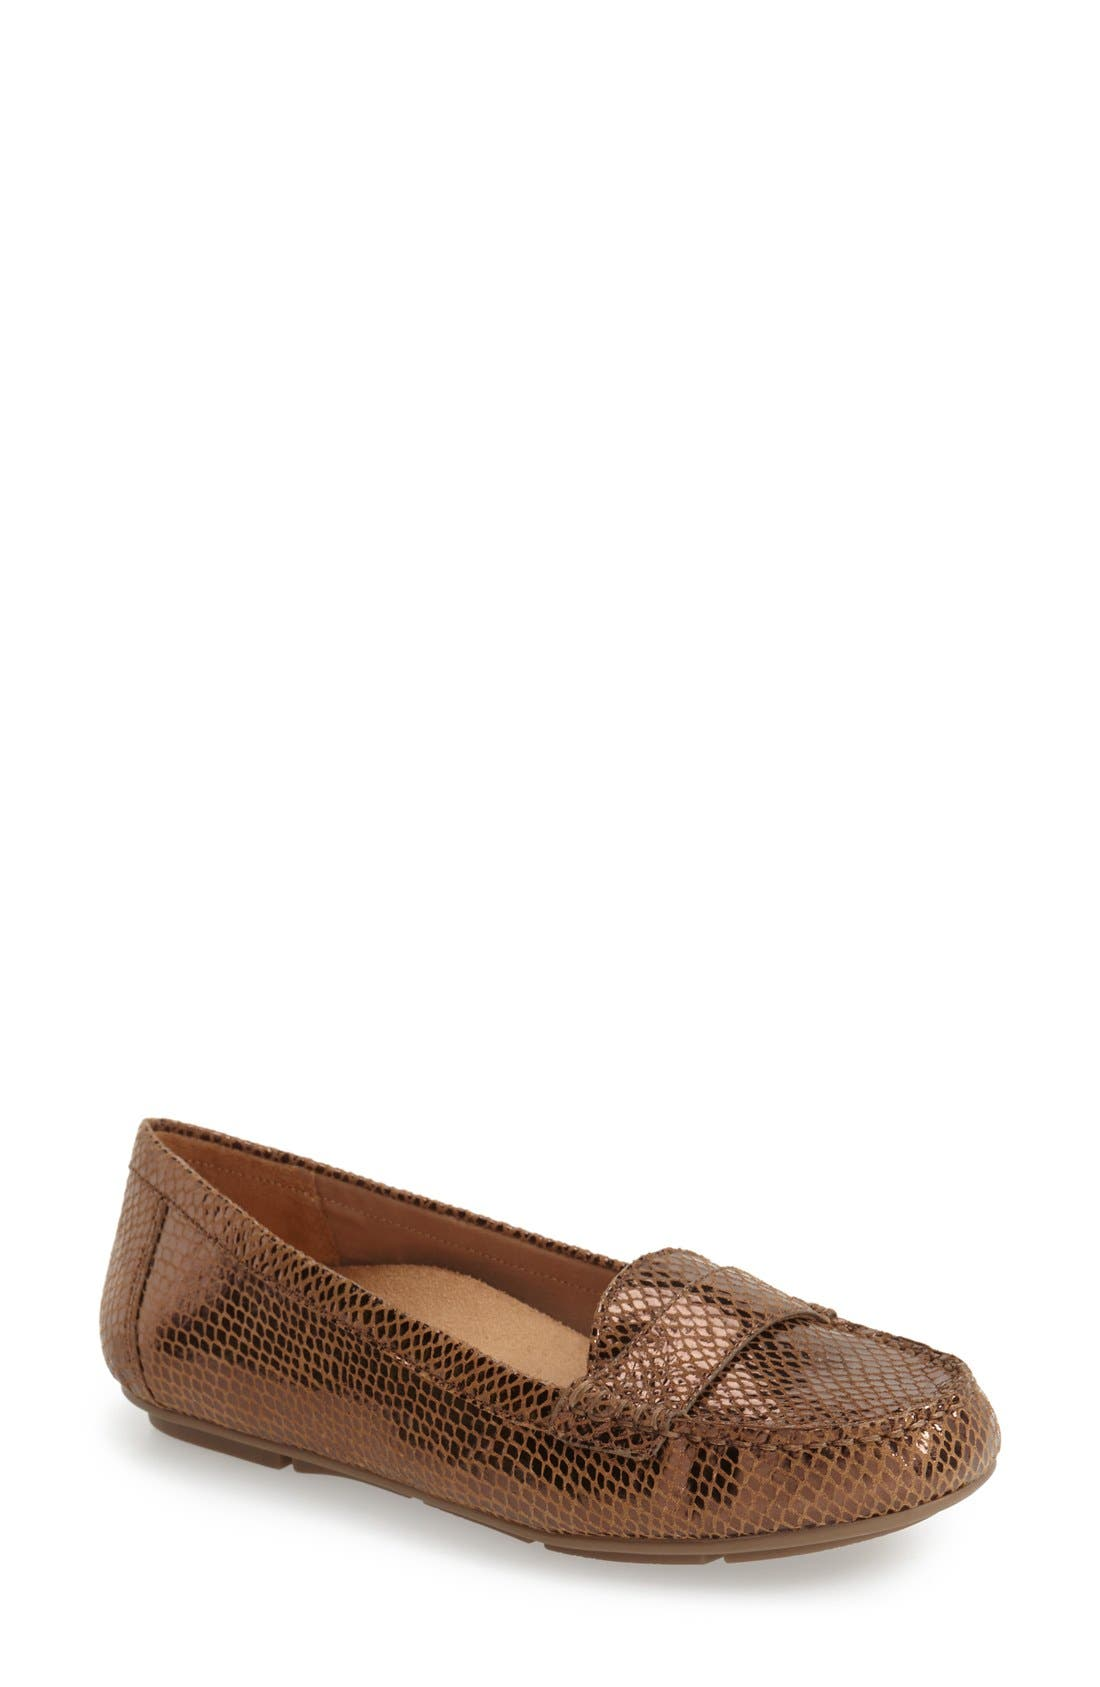 Vionic 'Larrun' Animal Print Loafer Flat (Women)